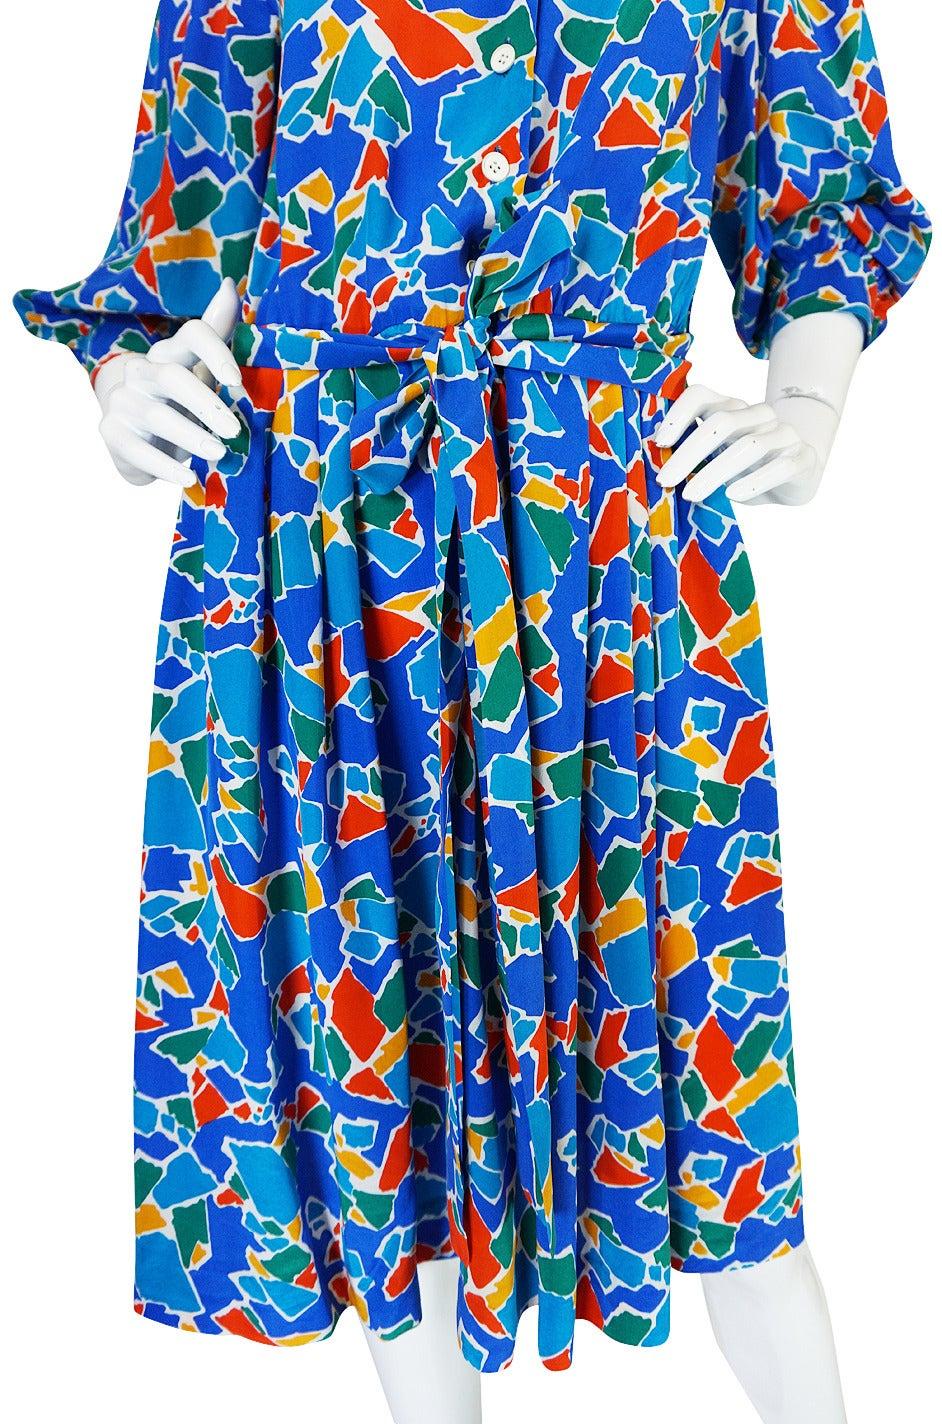 1980s Yves Saint Laurent Blue & Brights Silk Dress 8